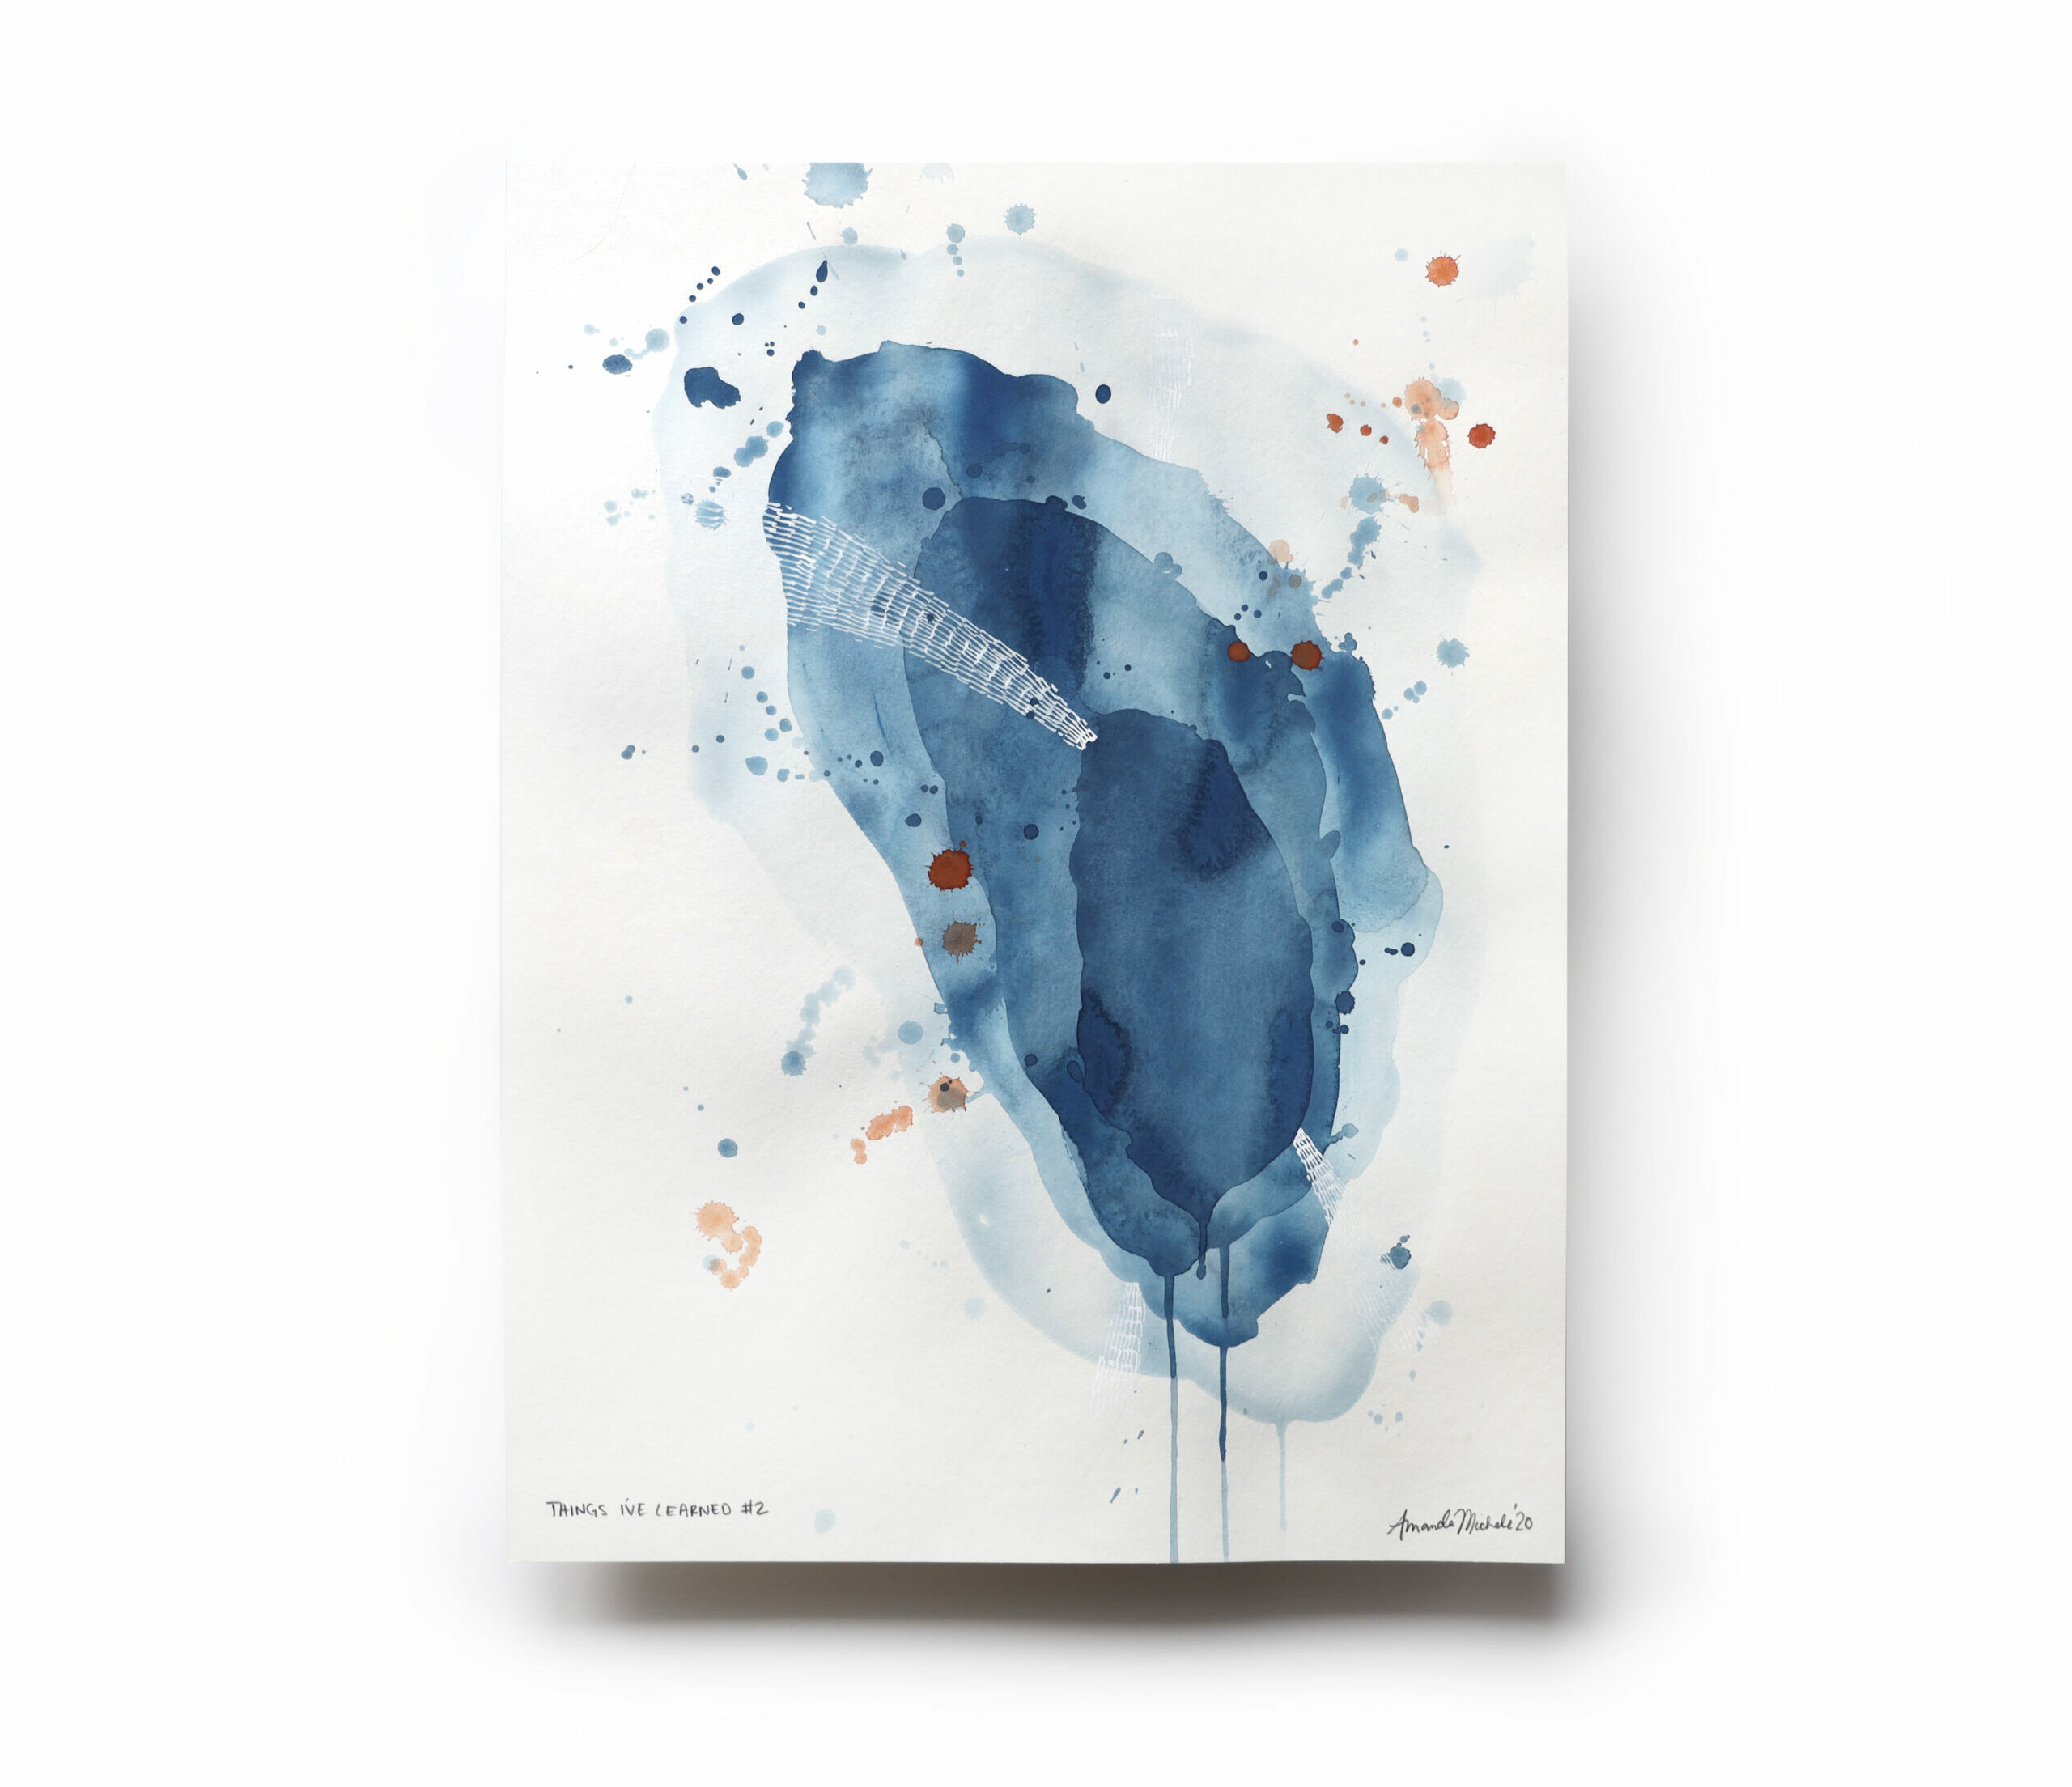 ThingsIveLearned2_float_medium - v